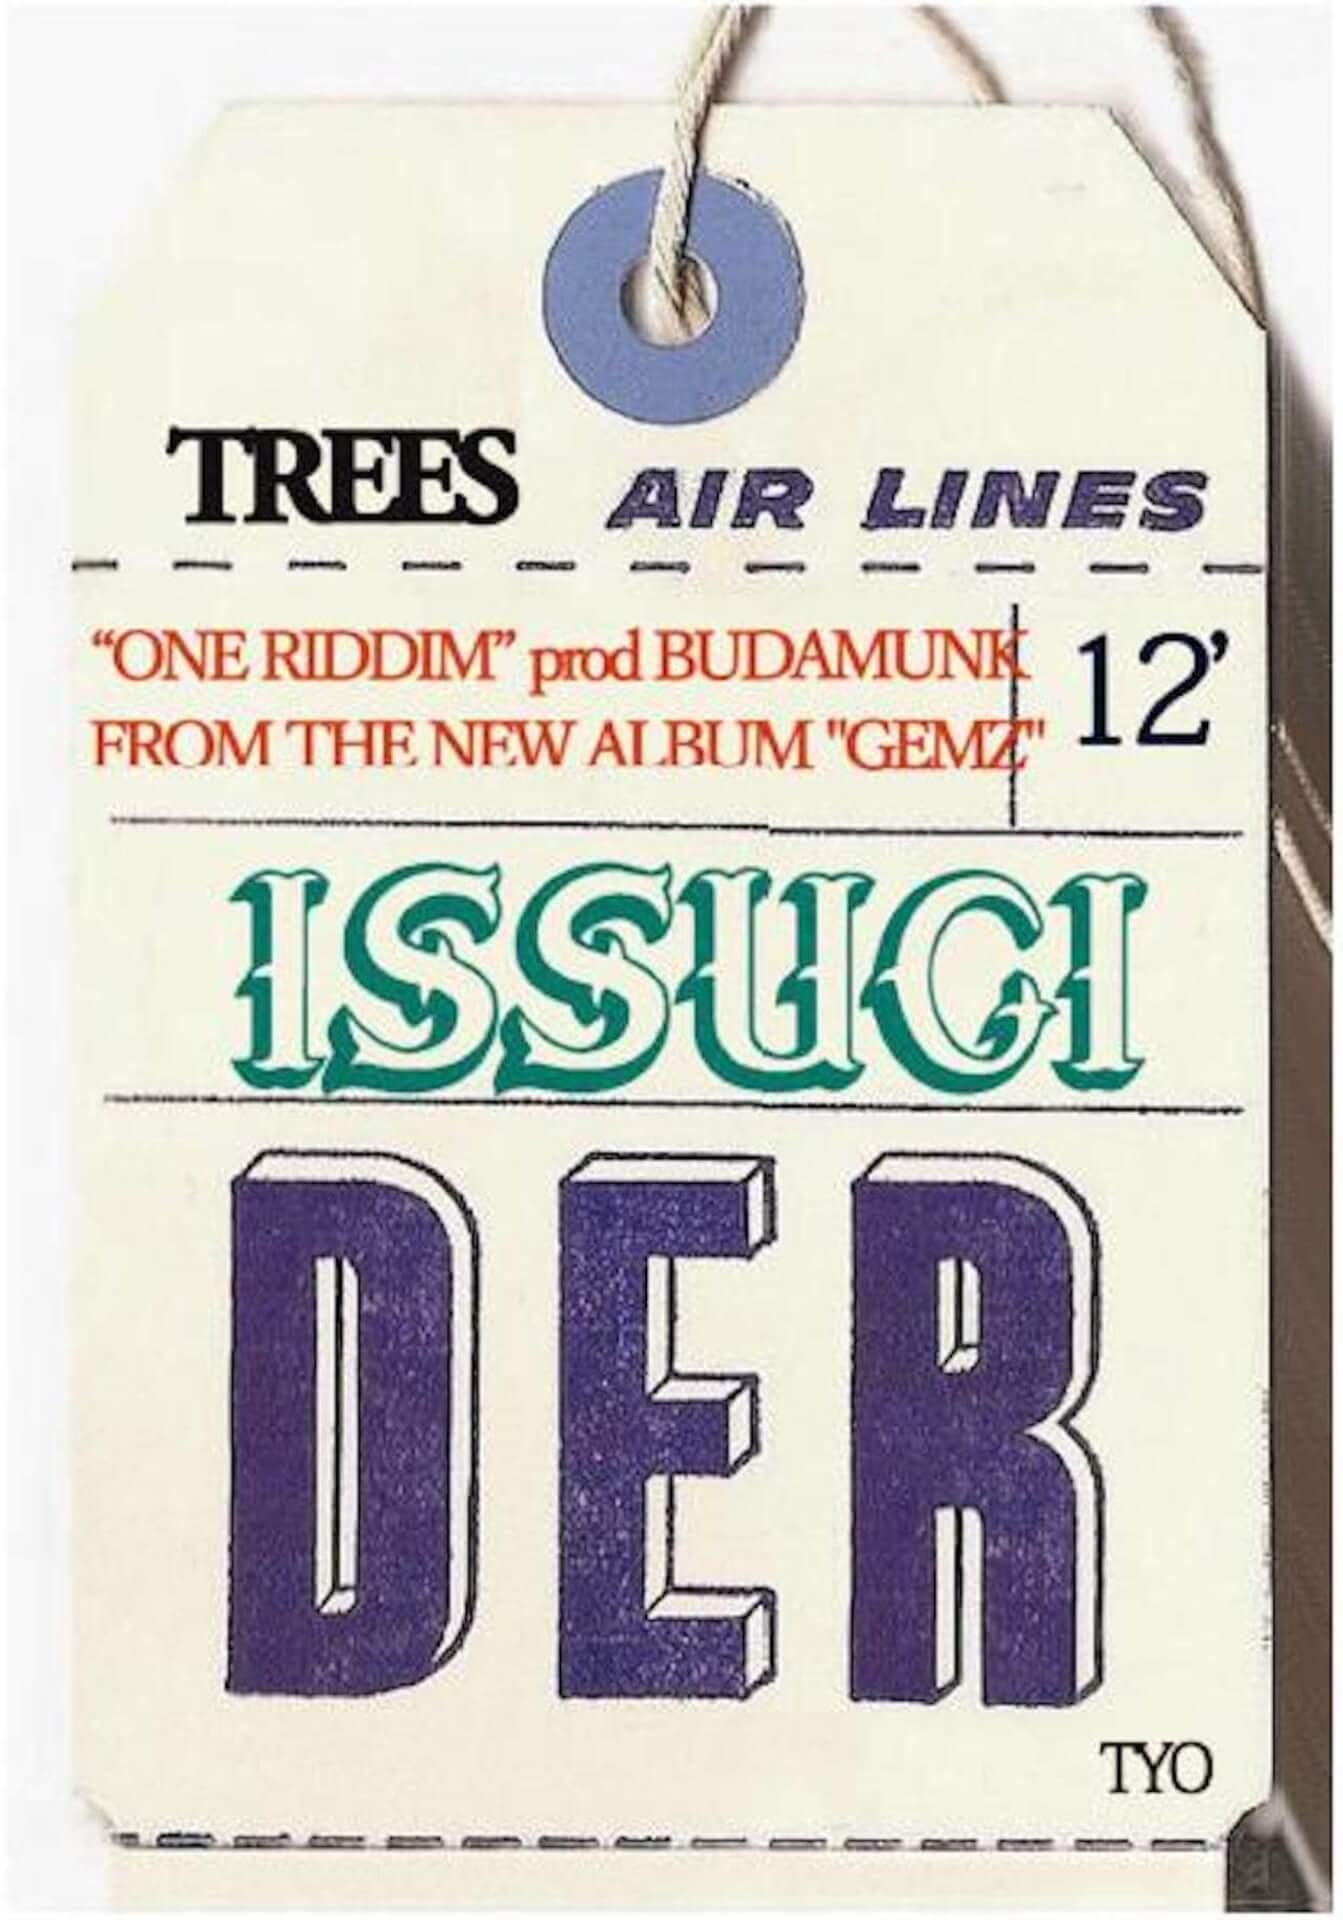 ISSUGI最新アルバム『GEMZ』のジャケット&トラックリストが解禁 Budamunkプロデュース曲収録の「ONE RIDDIM」が12EPとして本日リリース music191120_issugi_2